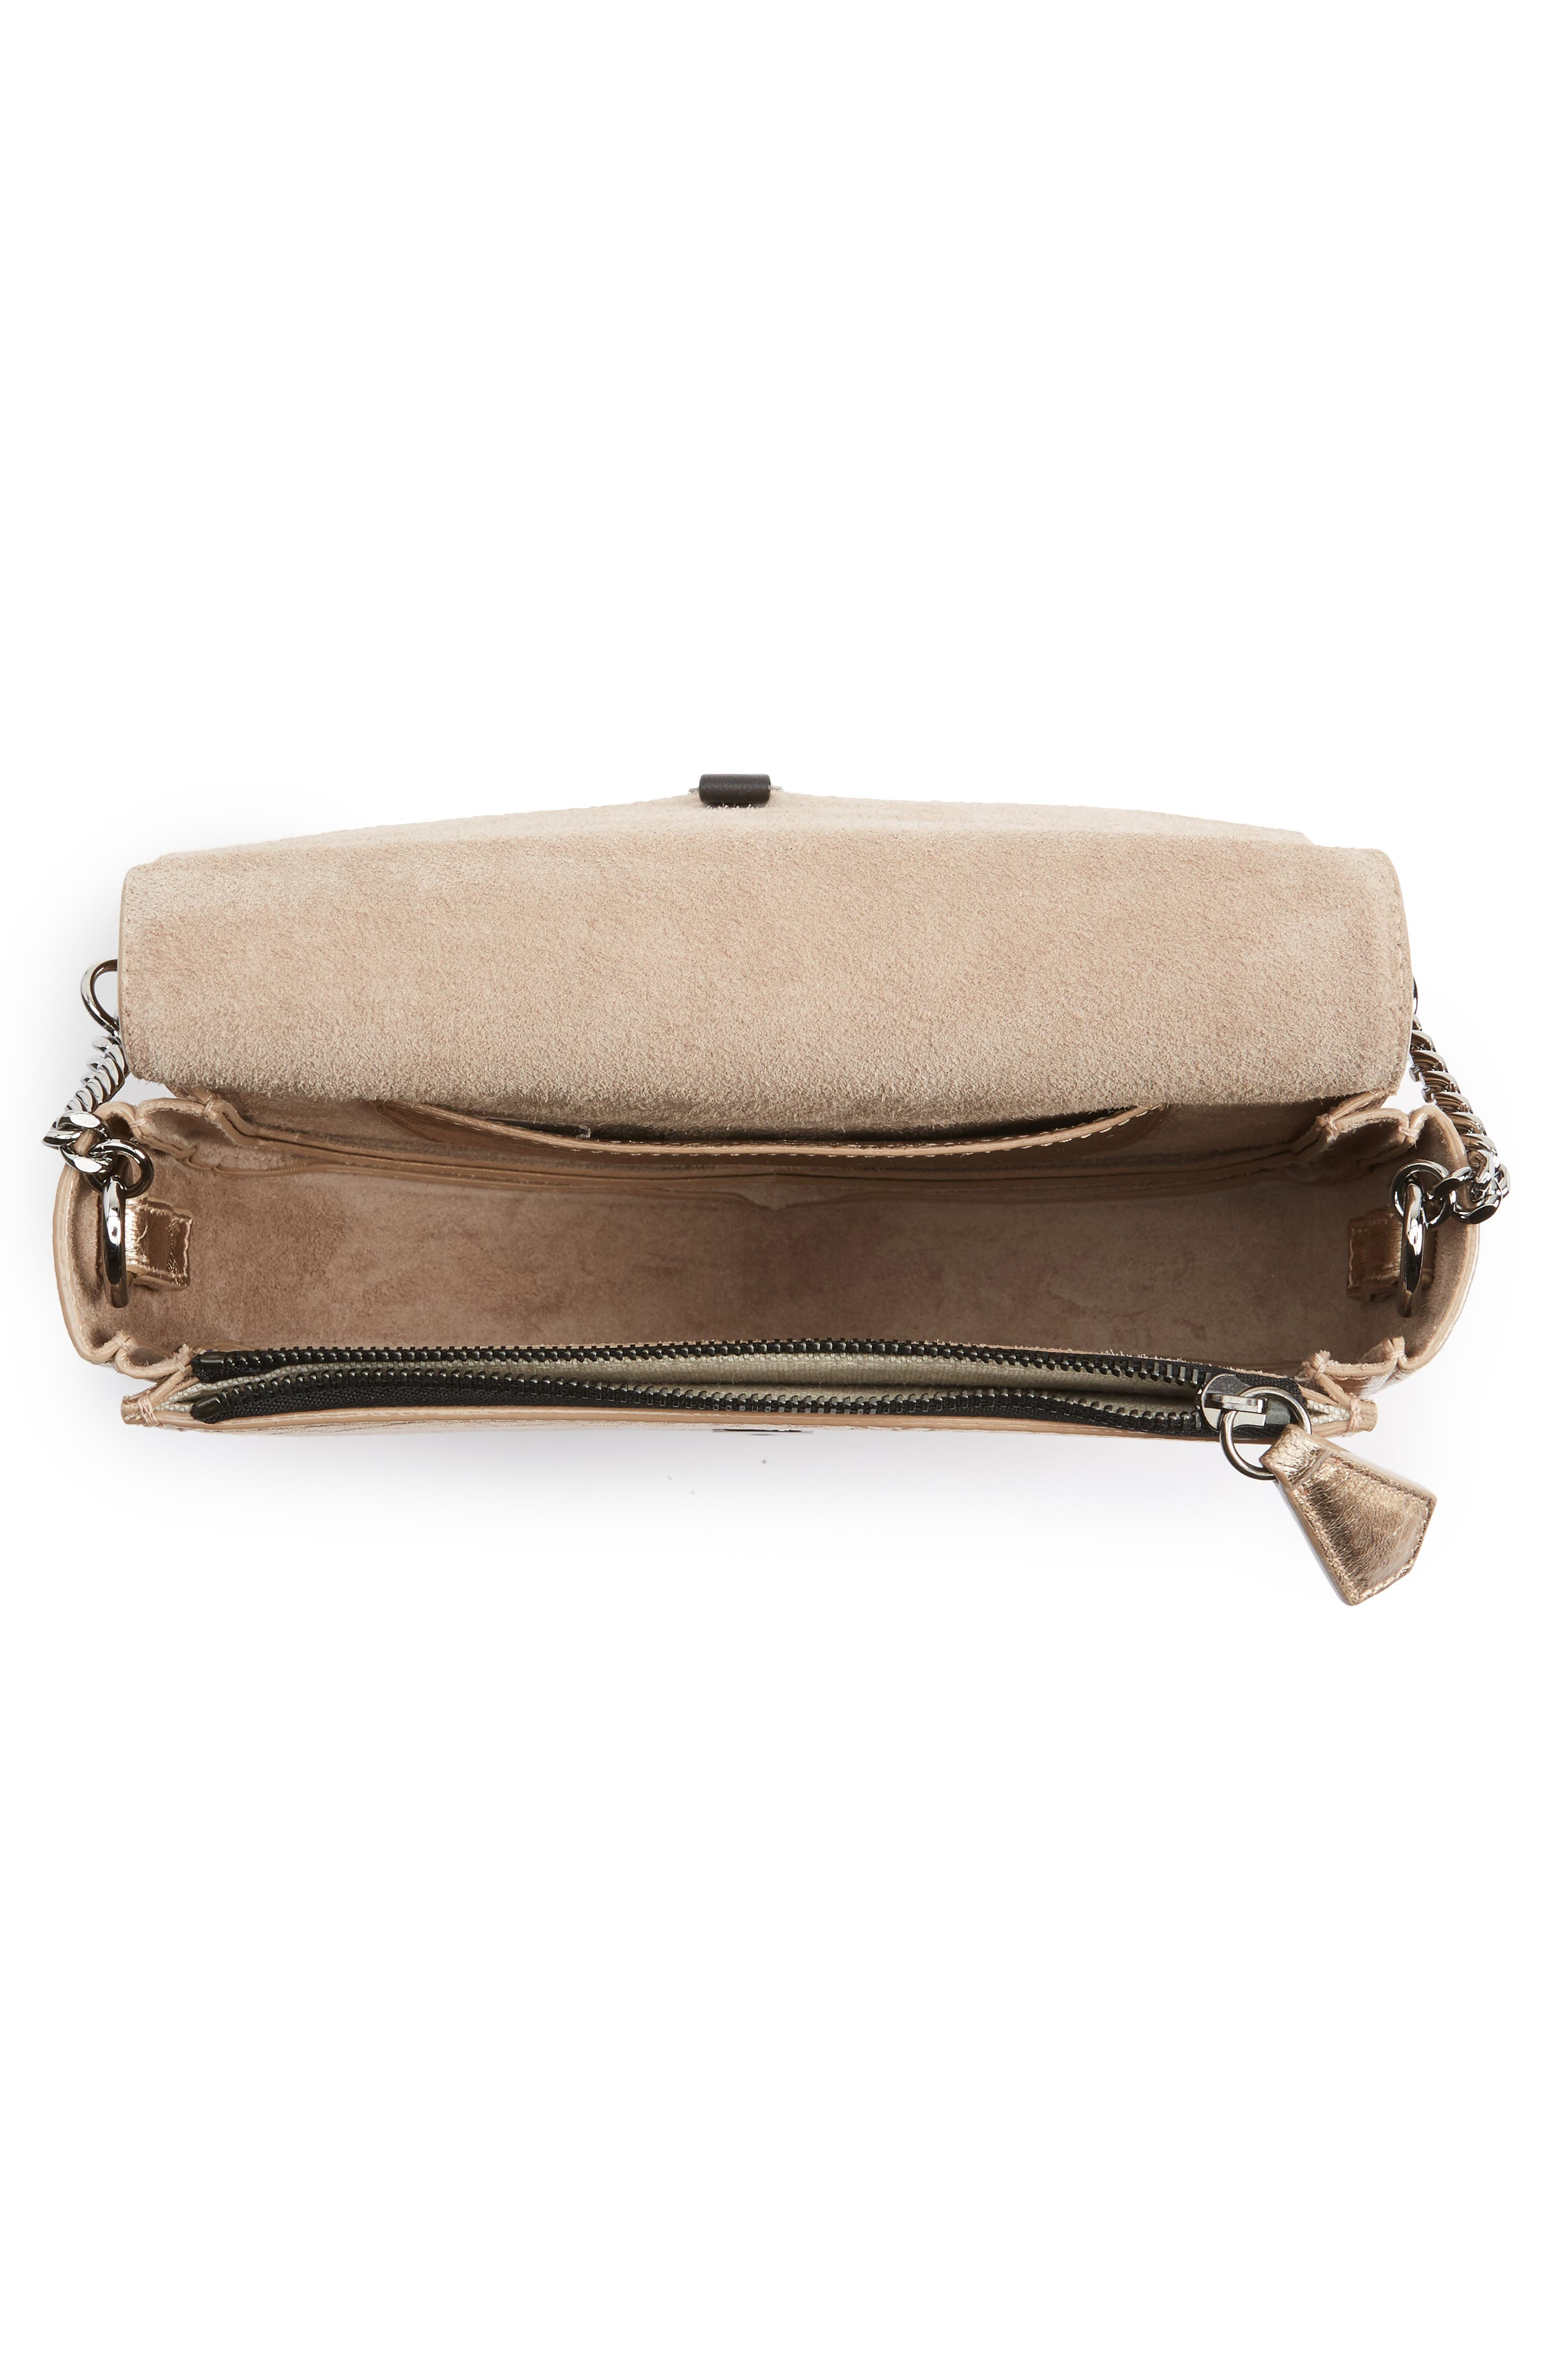 Arrow Metallic Grained Leather Shoulder Bag,                             Alternate thumbnail 12, color,